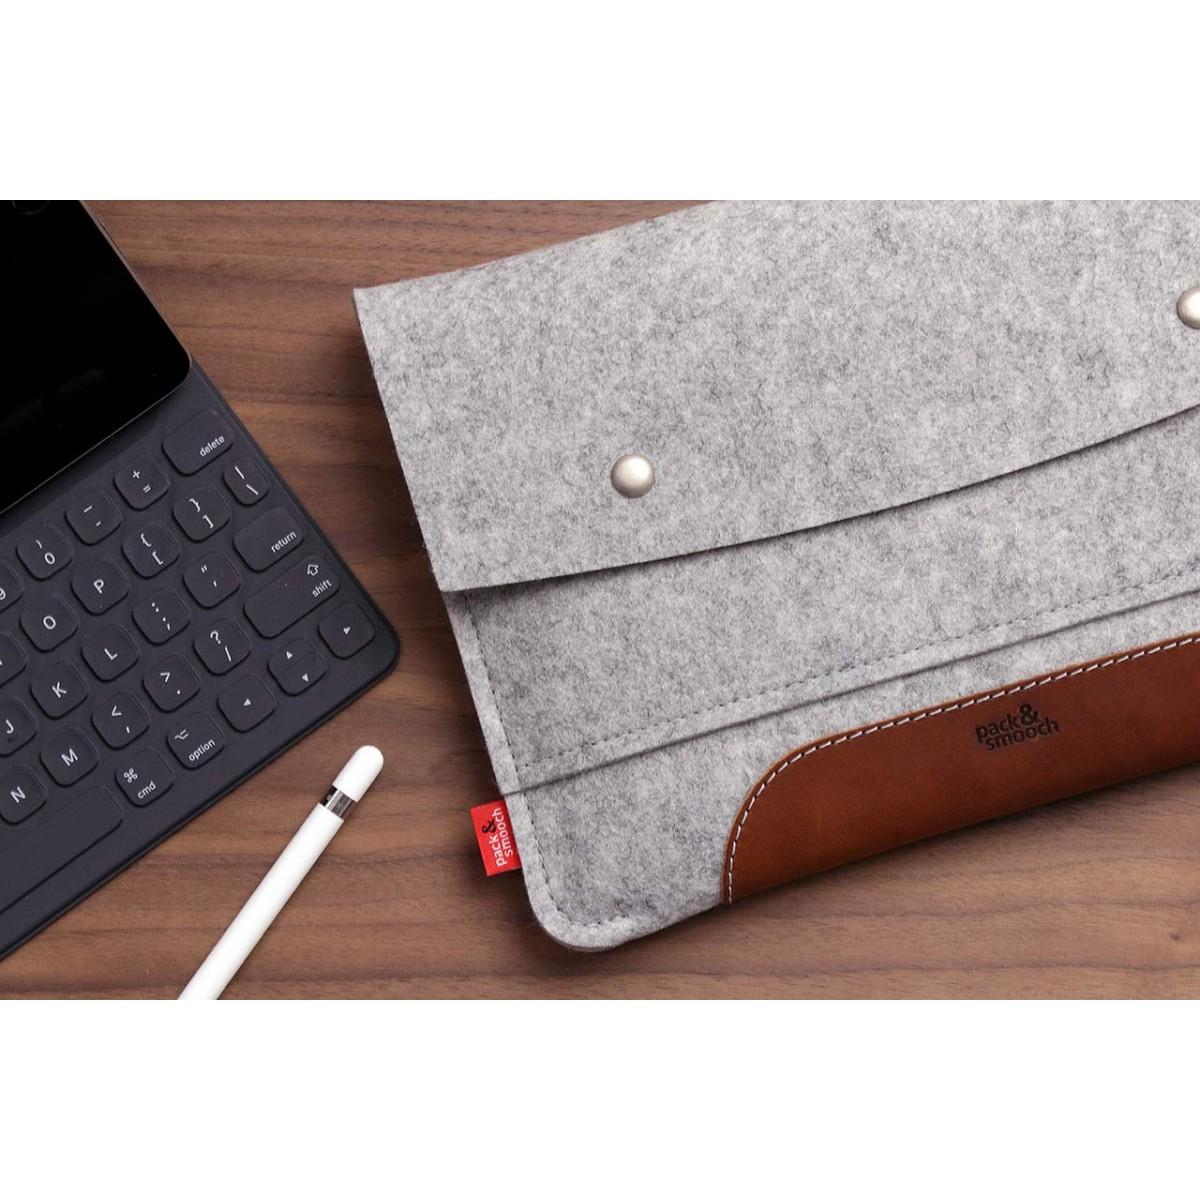 "iPad Pro 10.5"" Hülle, Case ""Hampshire"" 100% Merino Wollfilz, Pflanzlich gegerbtes Leder"